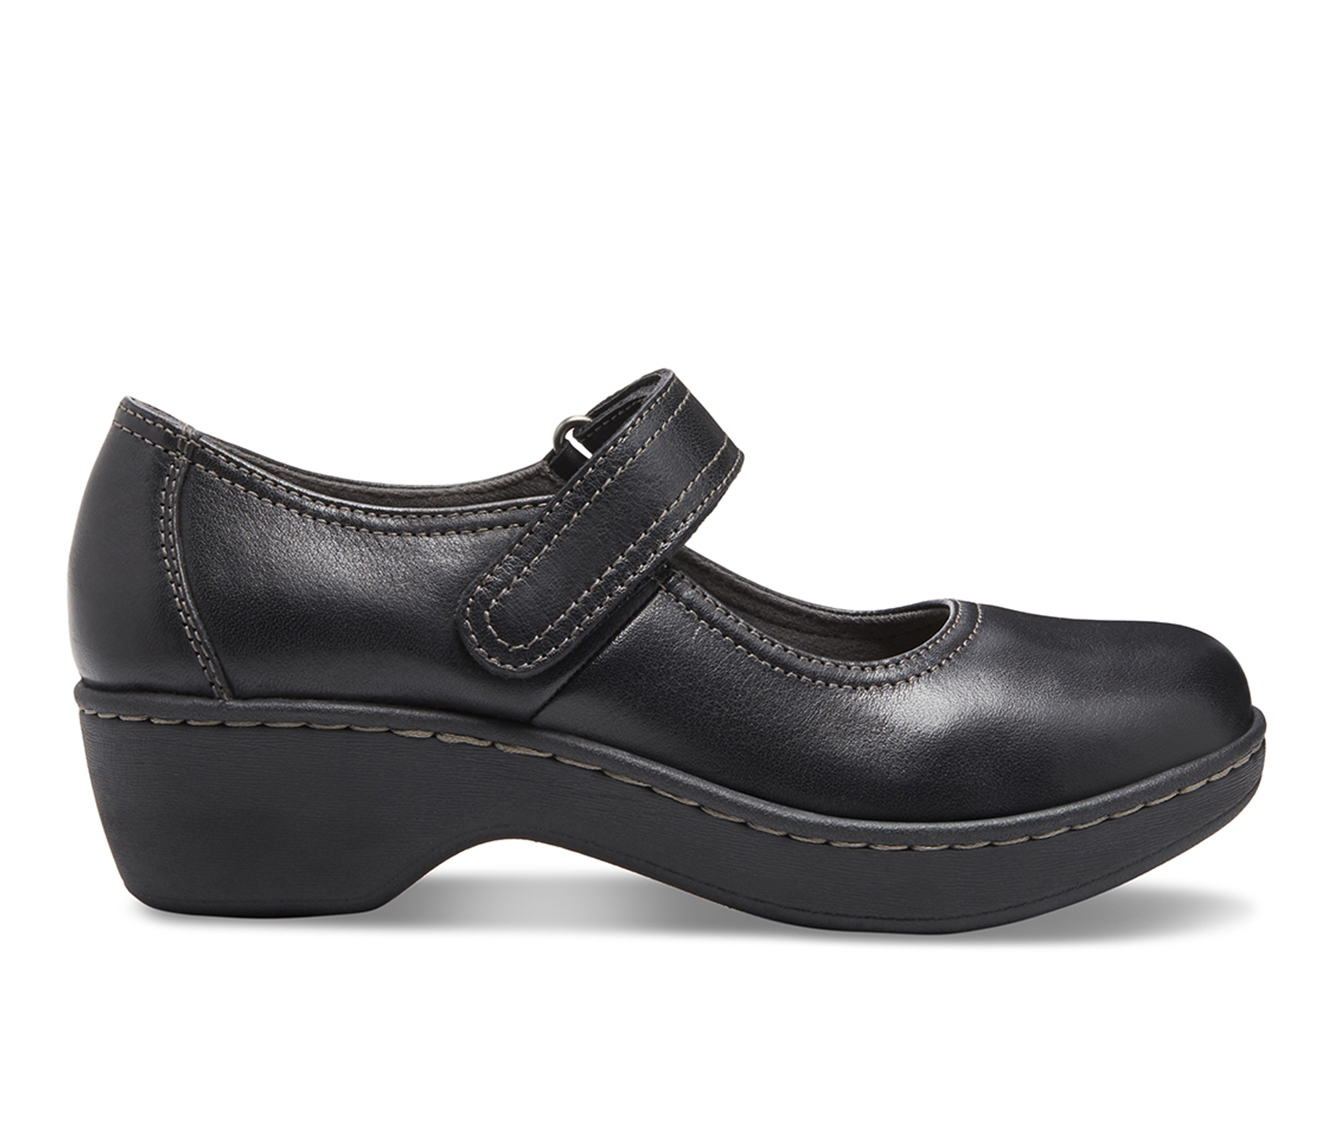 Eastland Gloria Women's Shoe (Black Leather)